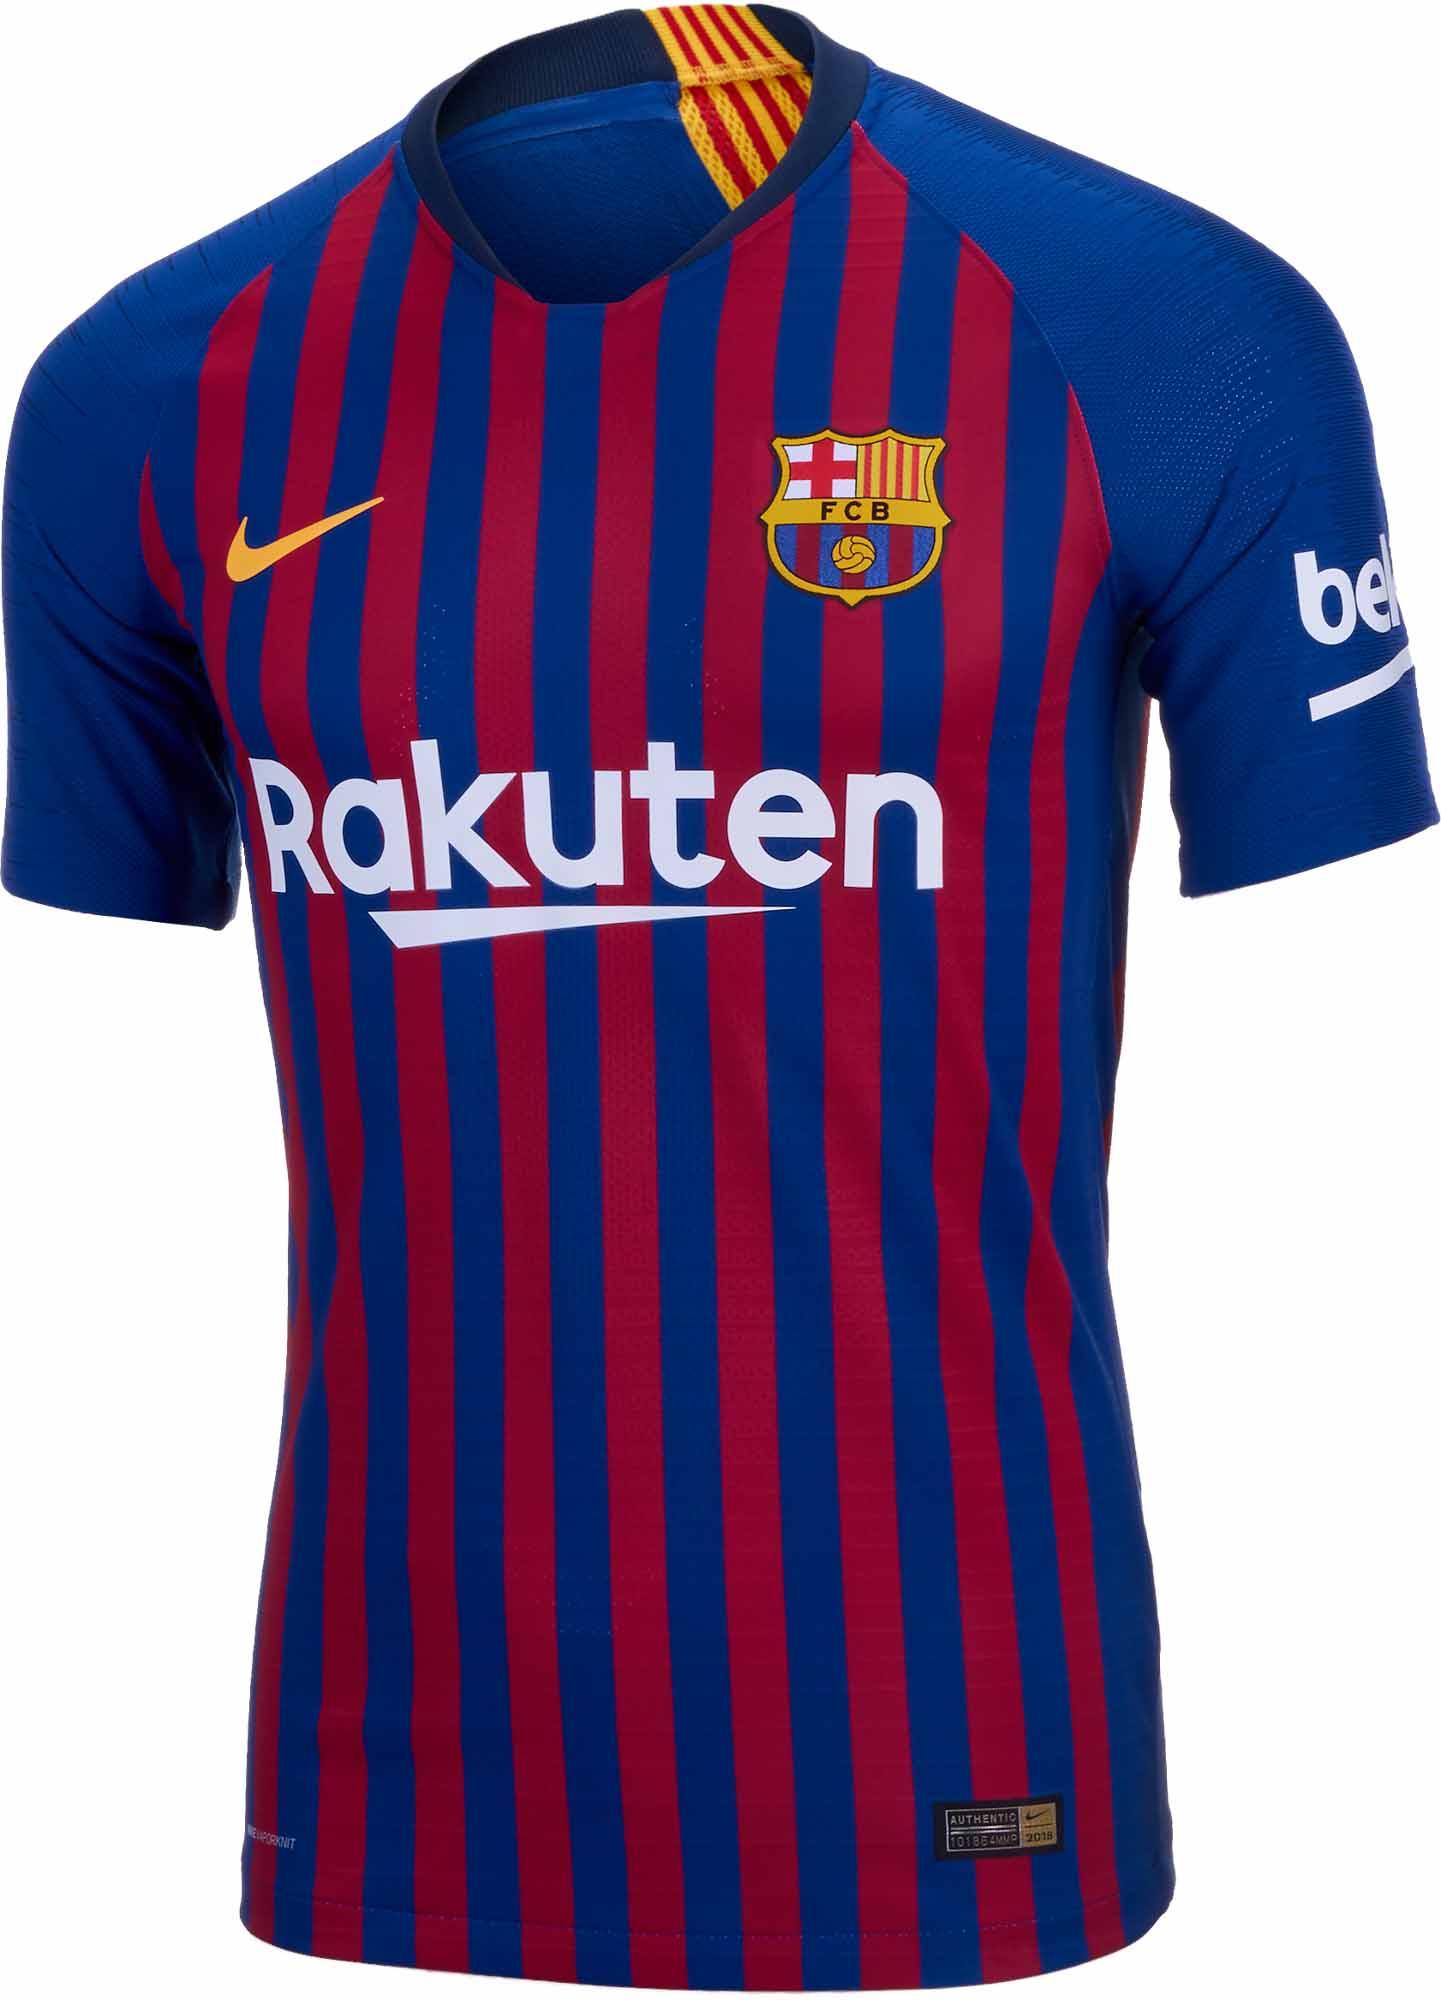 02232e87d 2018 19 Nike Barcelona Home Match Jersey - Soccer Master